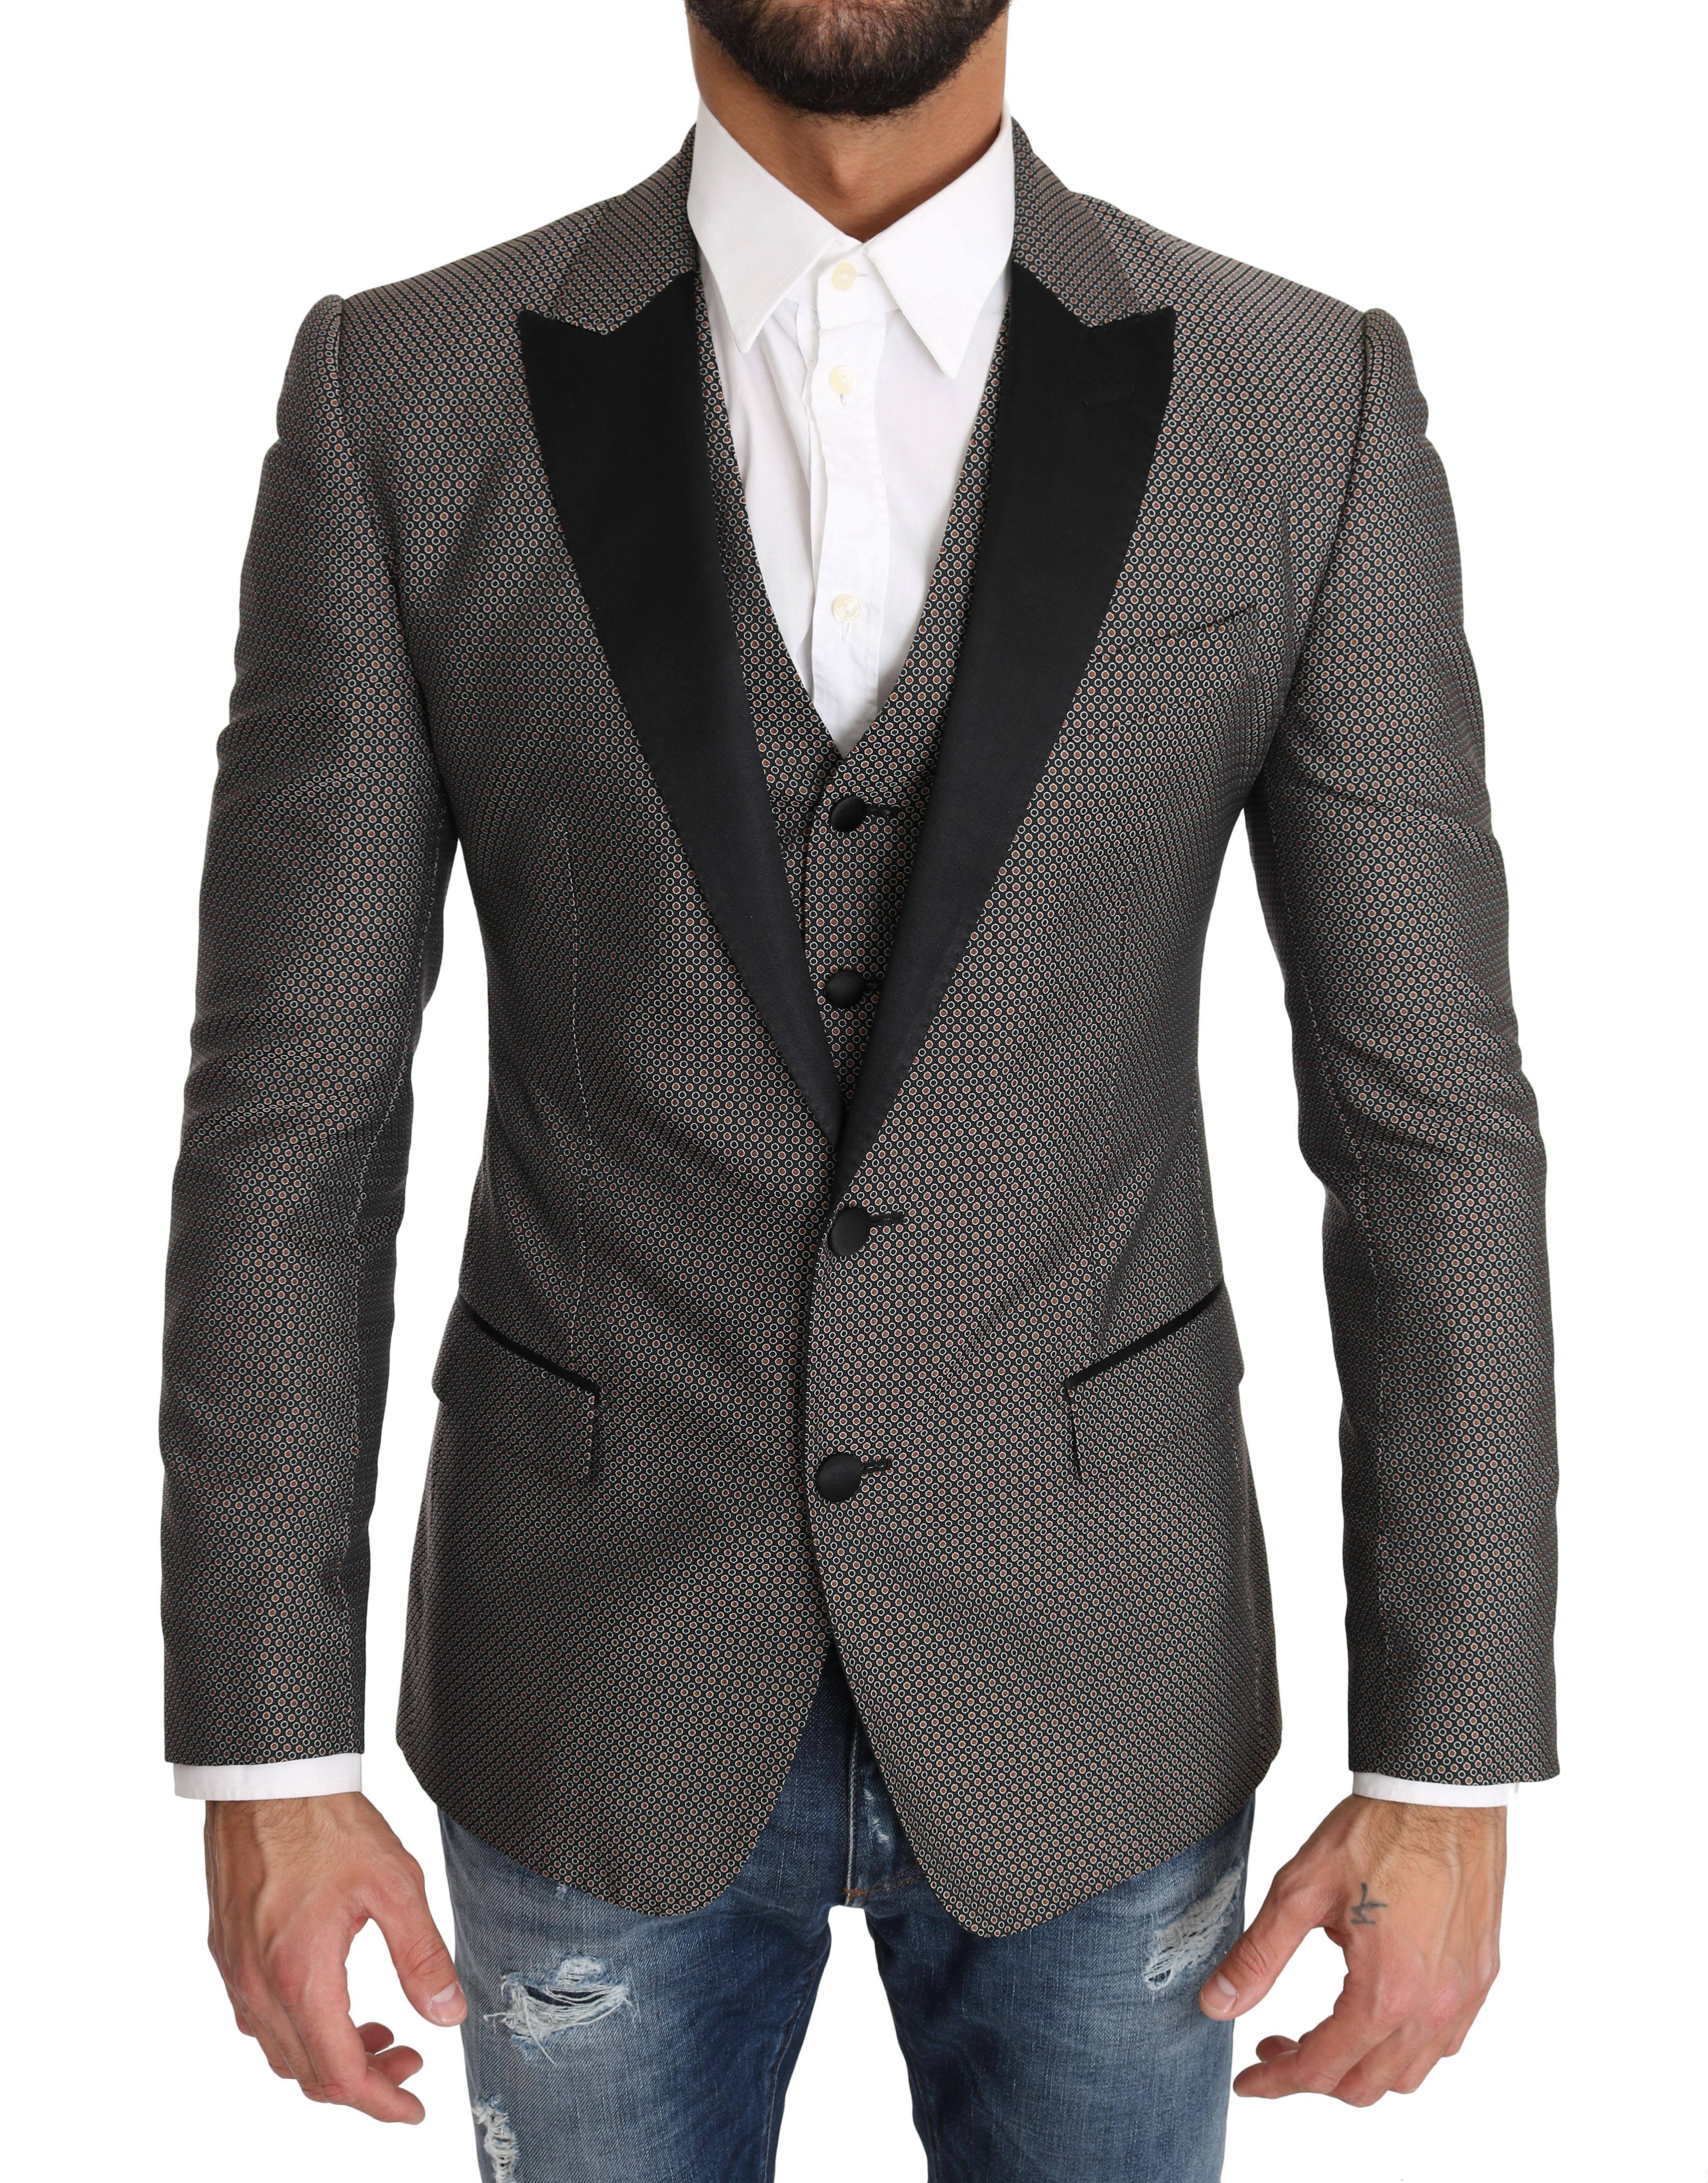 Dolce & Gabbana Men's Vest 2 Piece MARTINI Pattern Blazer Gray KOS1196 - IT46 | S